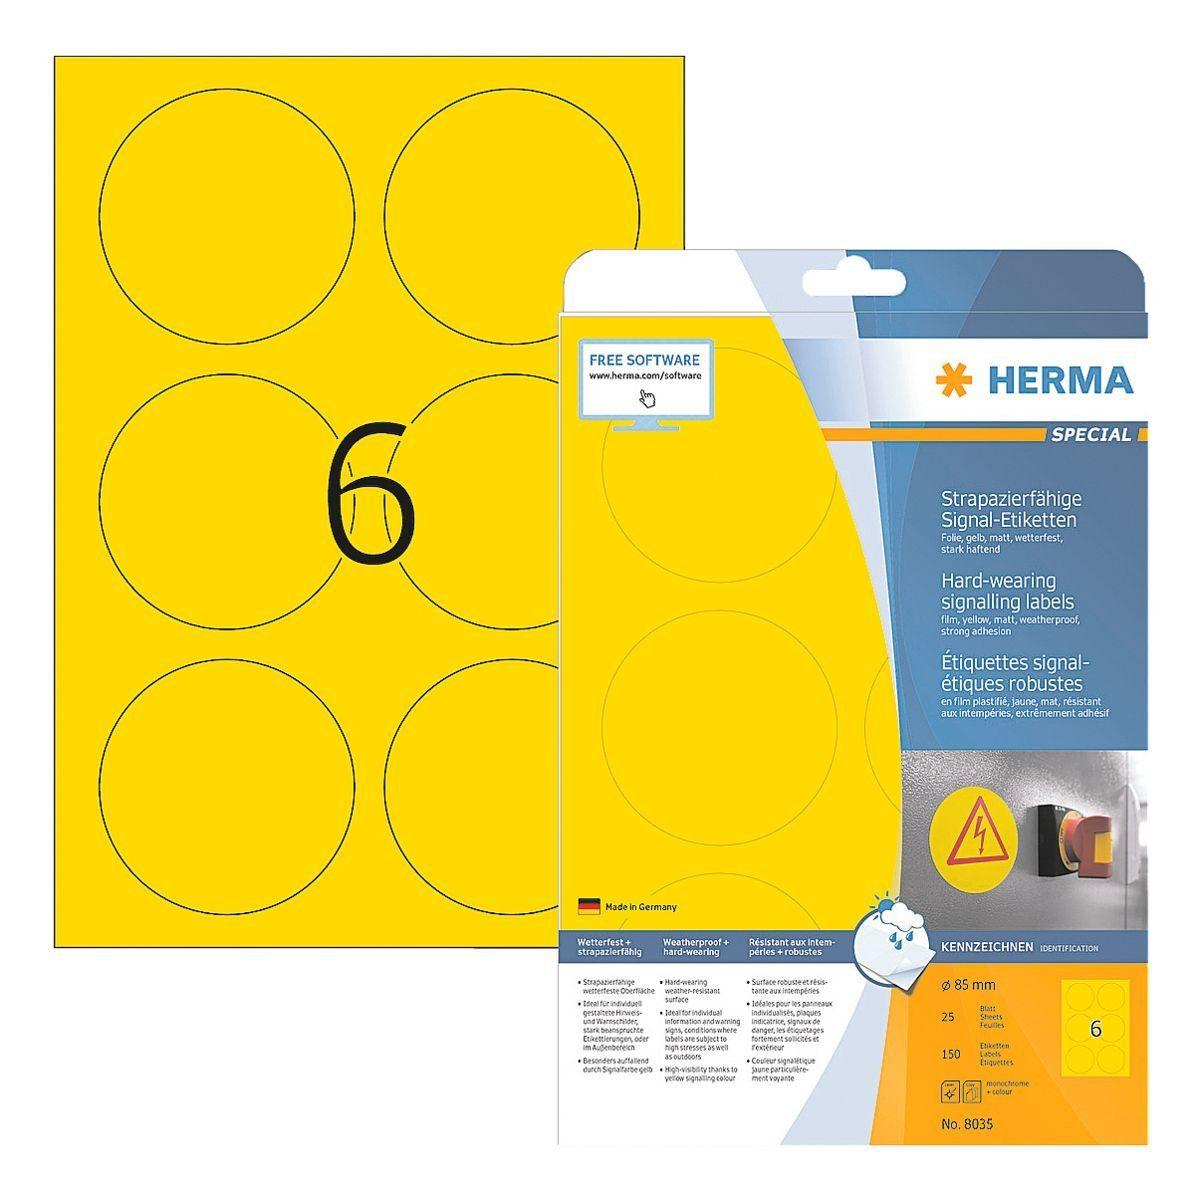 HERMA Outdoor Folien-Etiketten 150 Stück »Special«